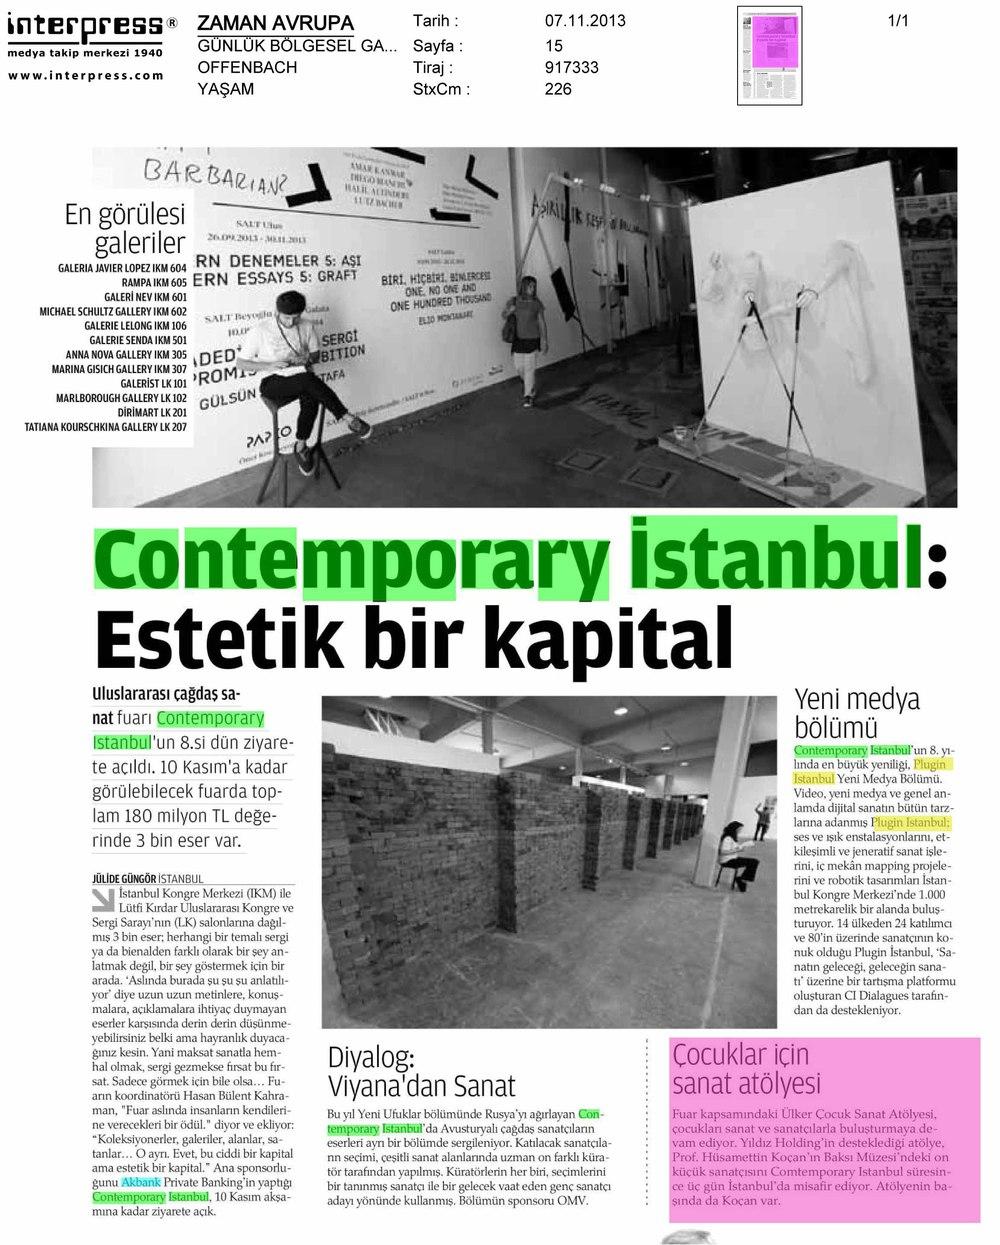 Zaman Avrupa - Bölgesel Günlük Gazete Ek - 07.jpg